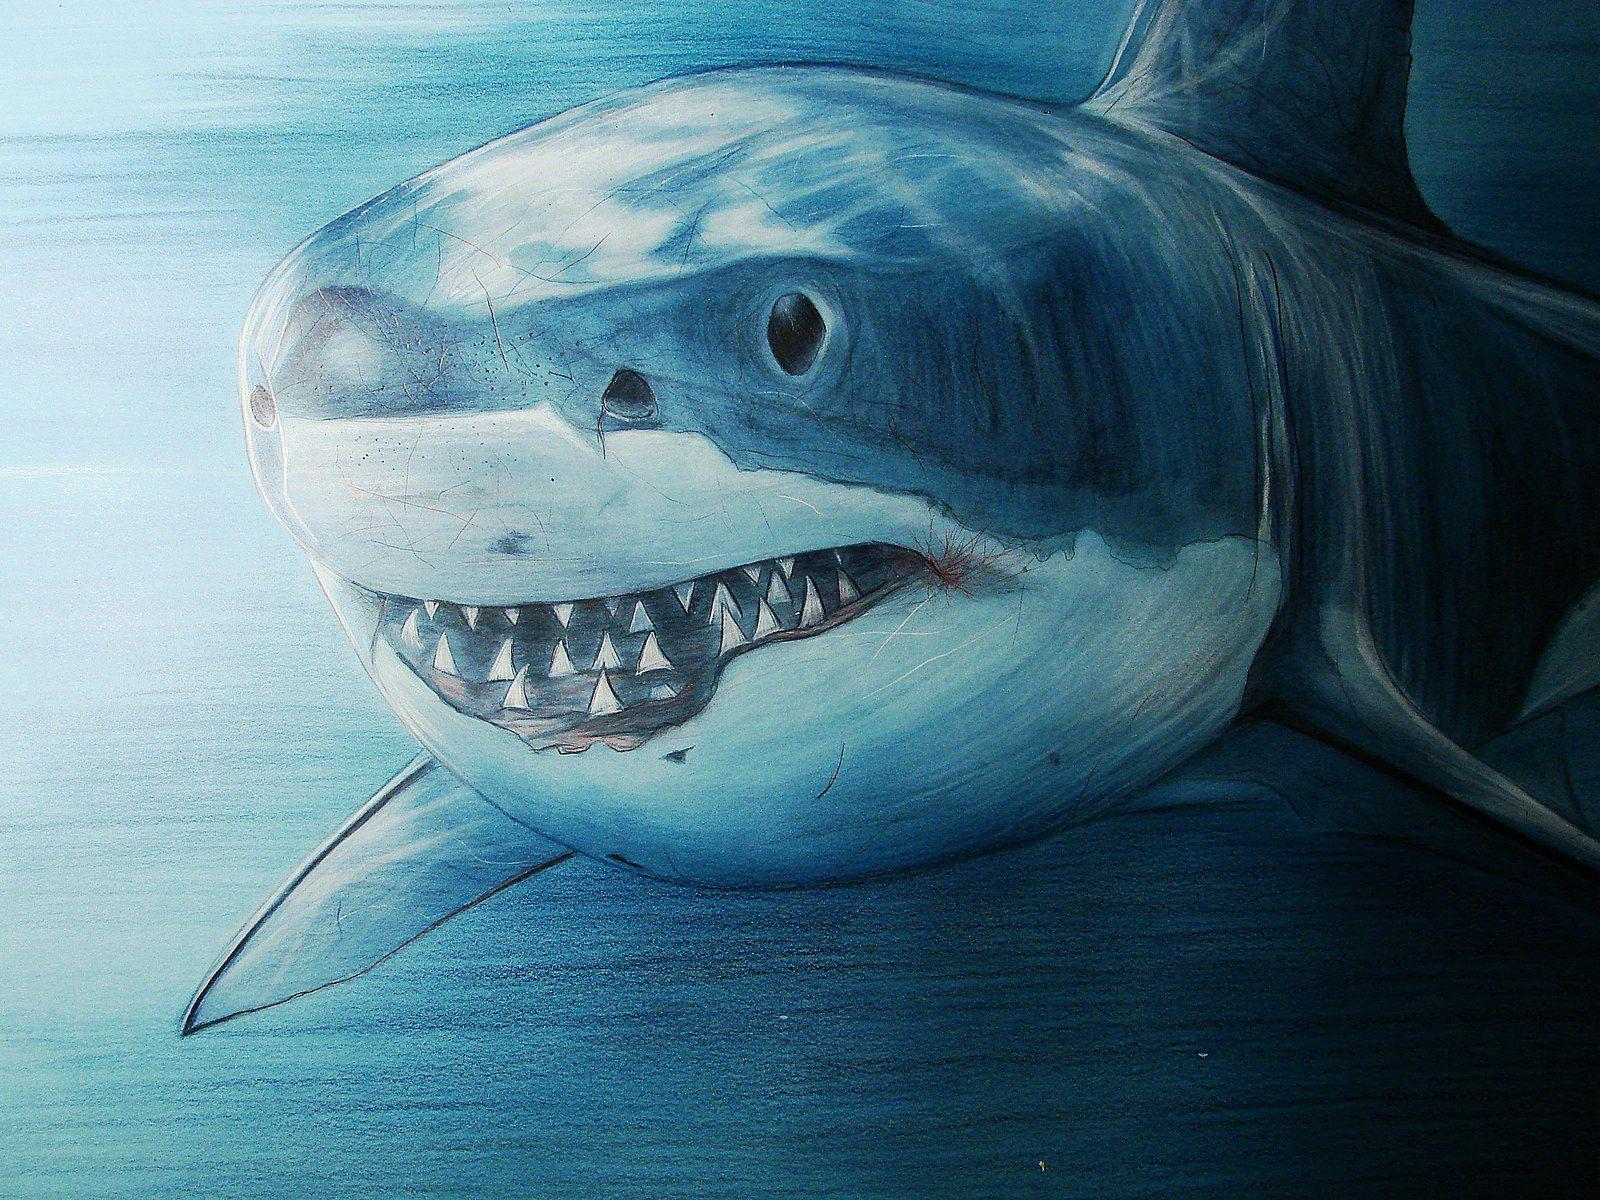 Буратино, крутые рисунки акул